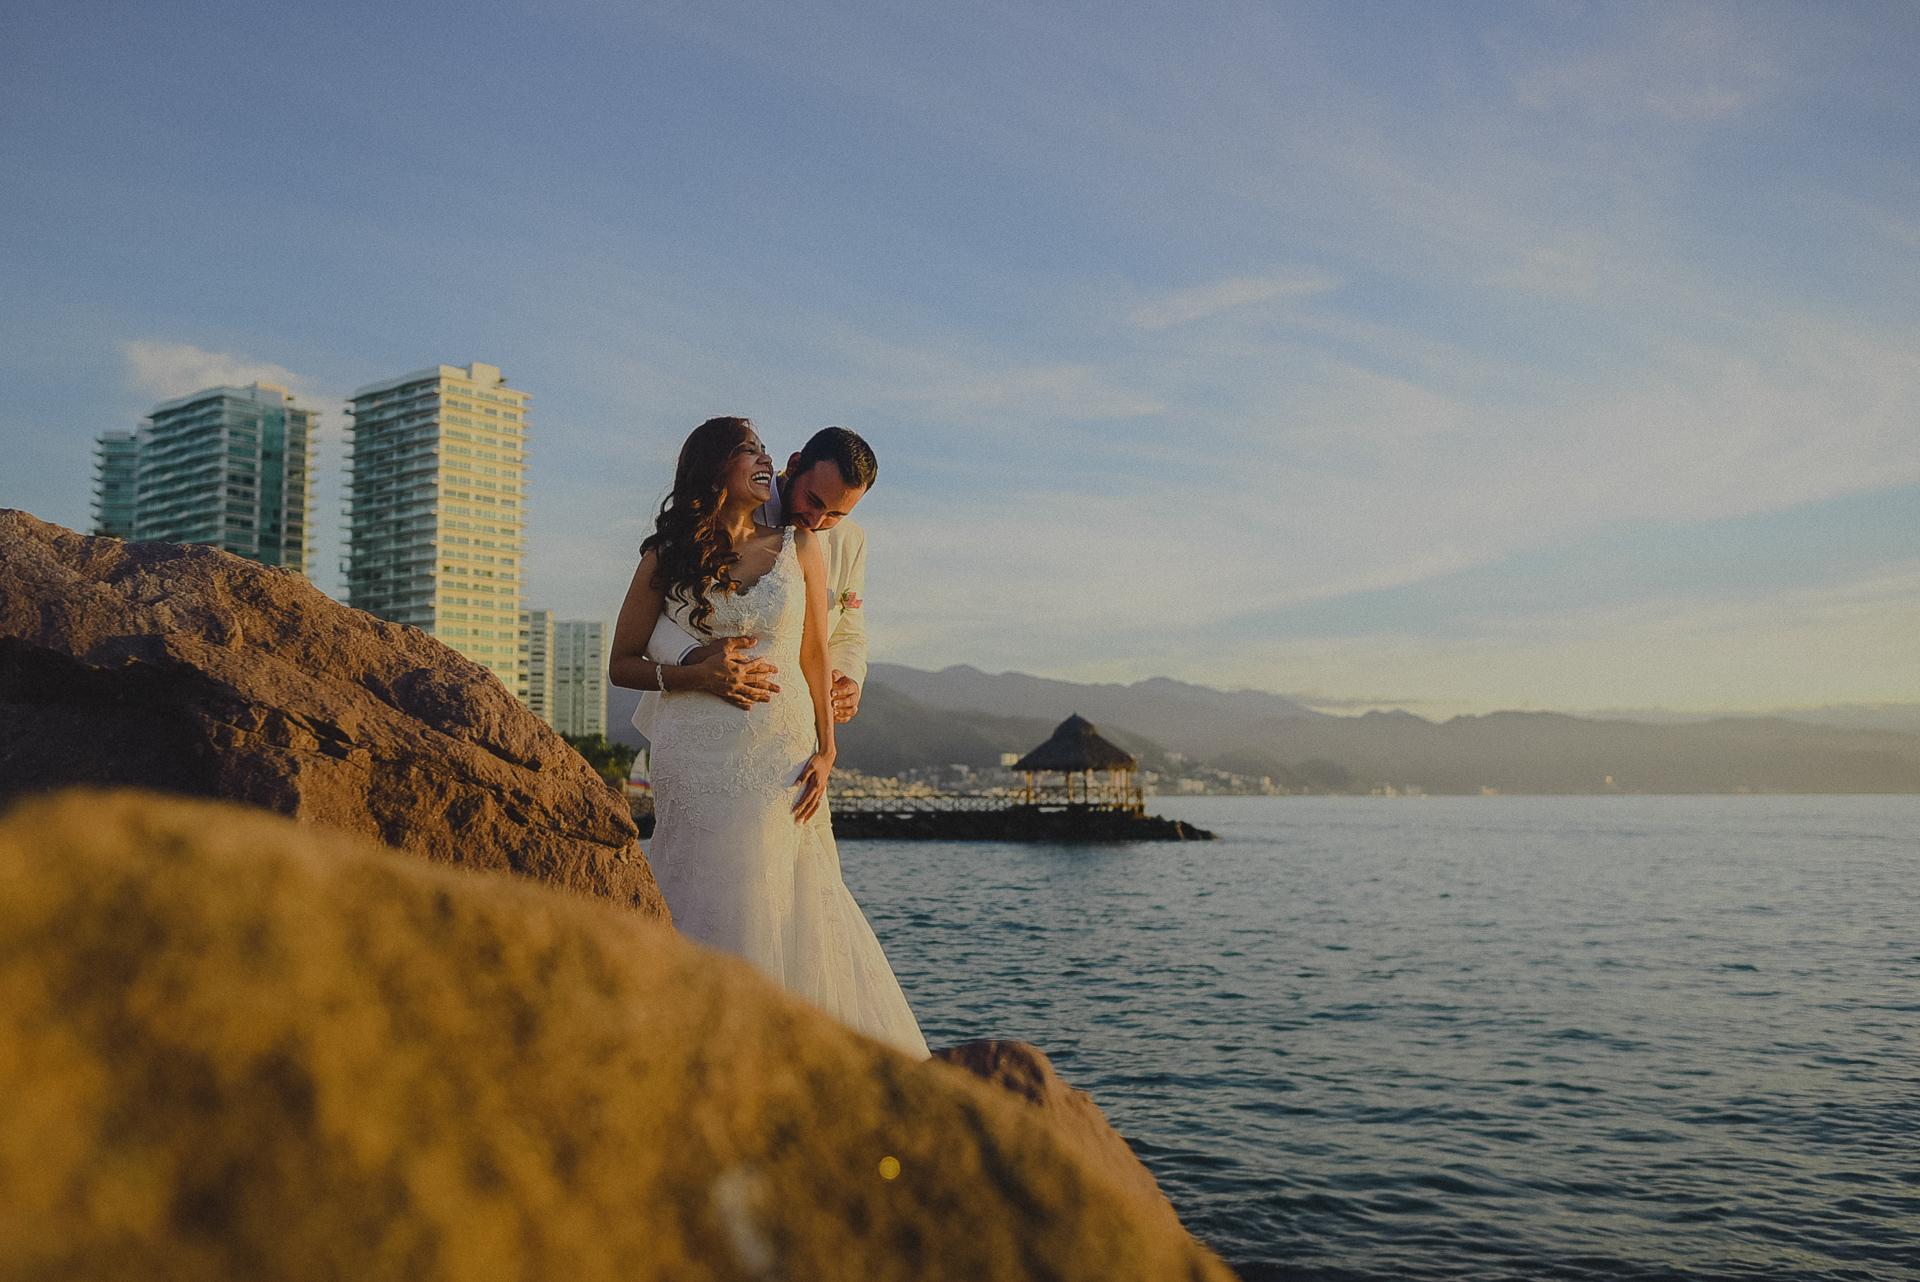 Wedding N&M BLOG luishoudin.com (82 de 174)